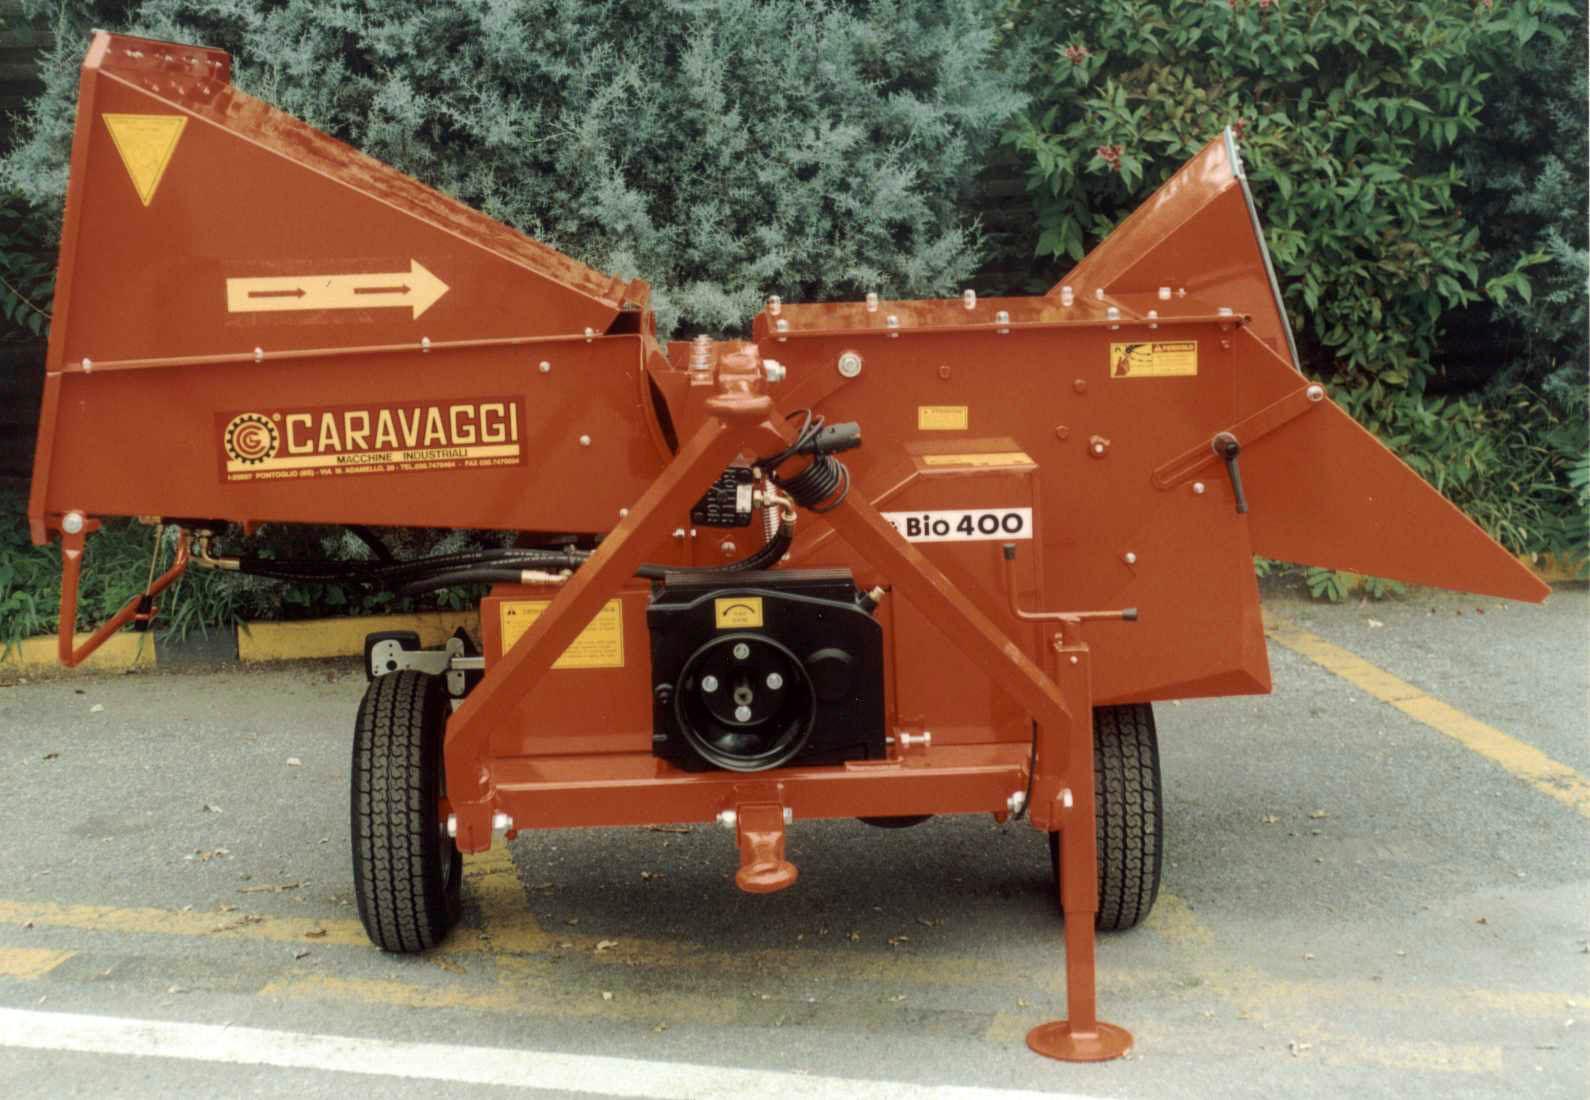 CARAVAGGI - BIO 400 T